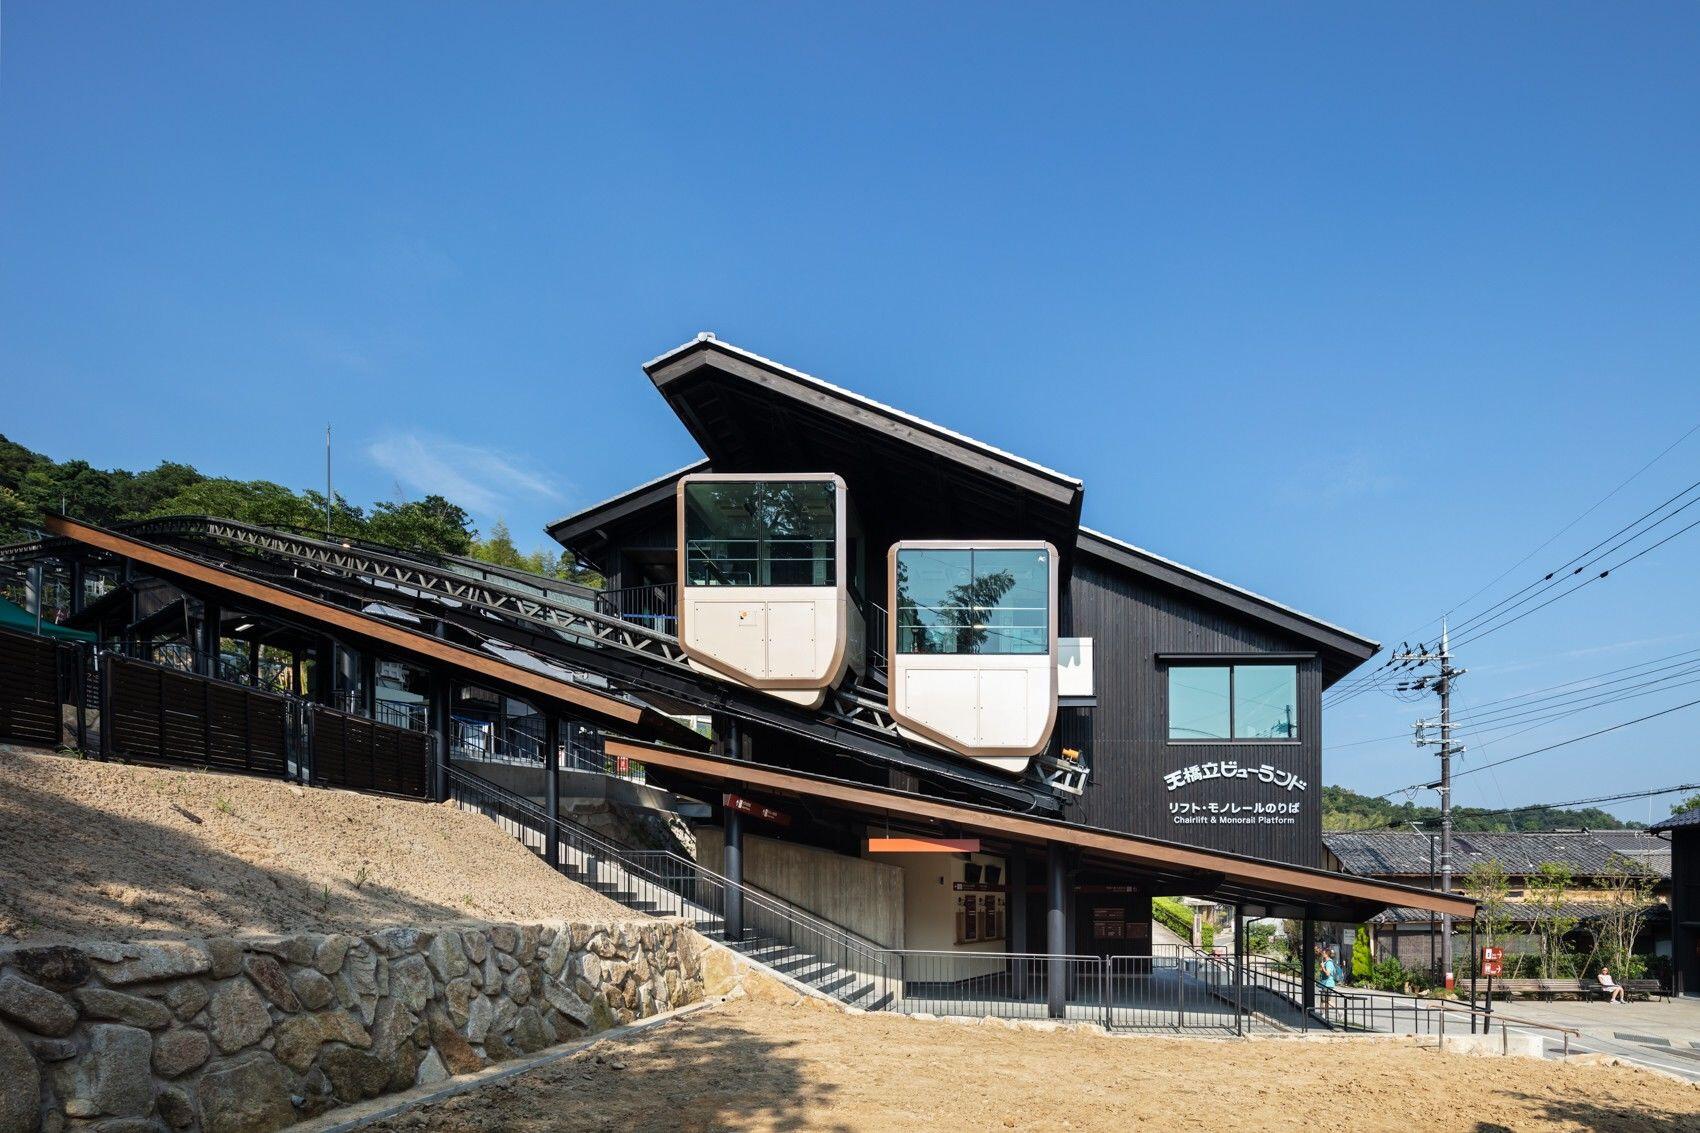 Monorail station of Amanohashidate view land